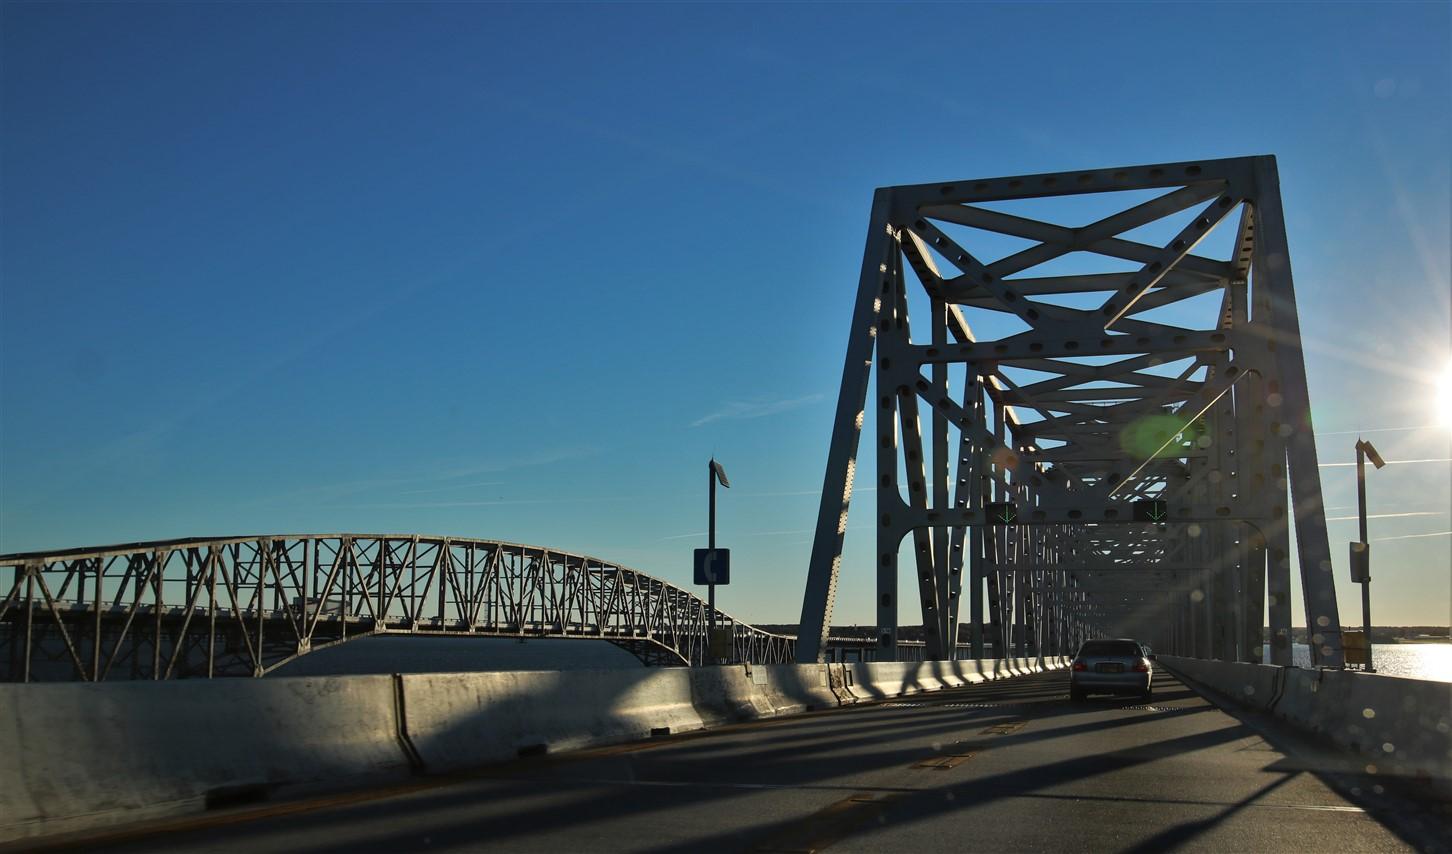 2016 11 07 9 Annapolis MD Bay Bridge.jpg